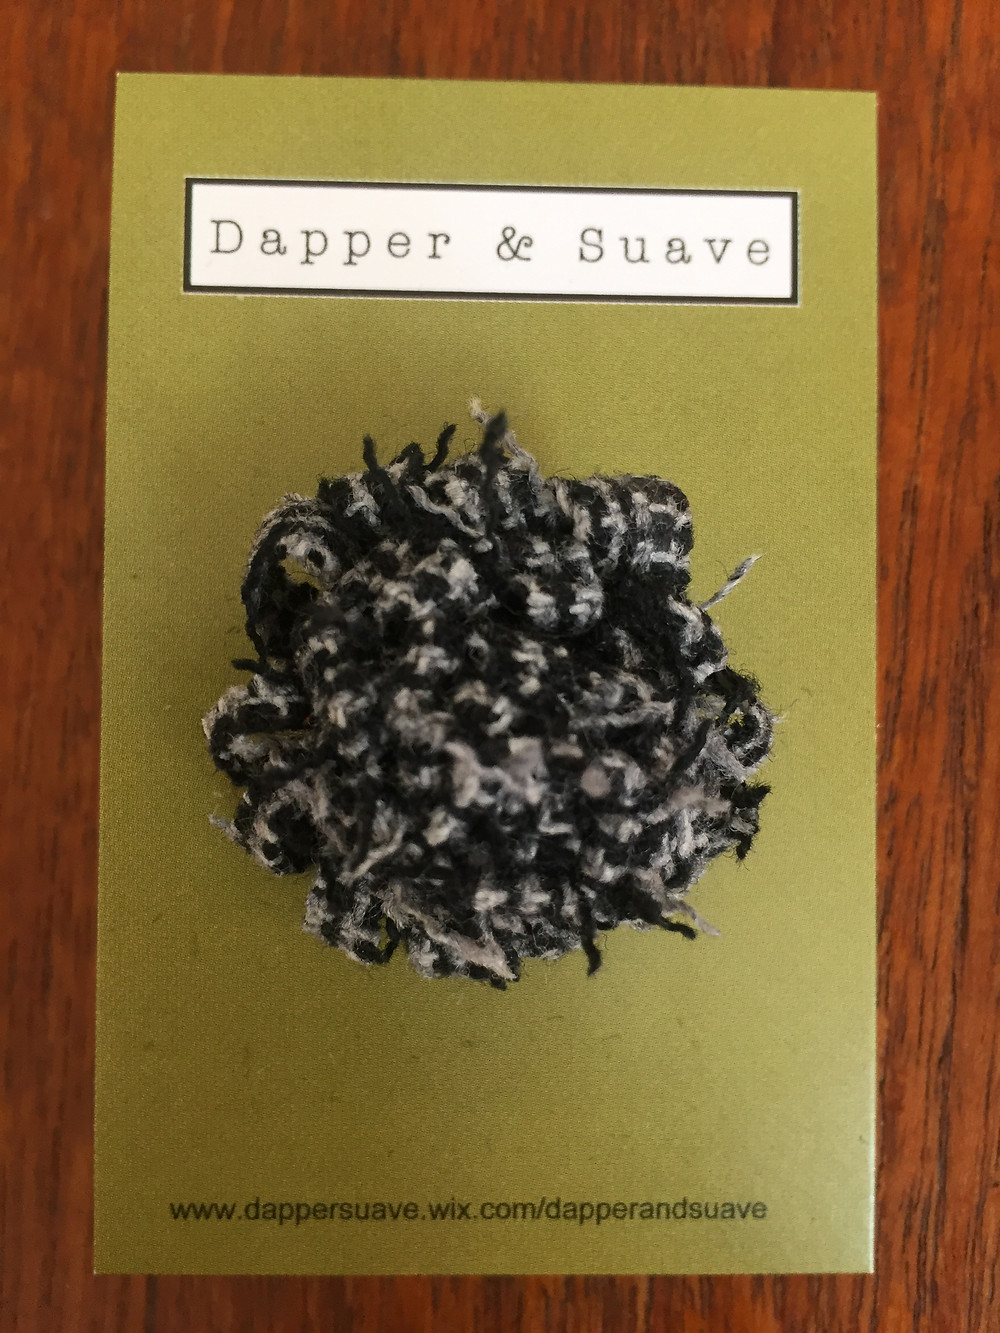 Dapper & Suave Tweed Lapel Pin